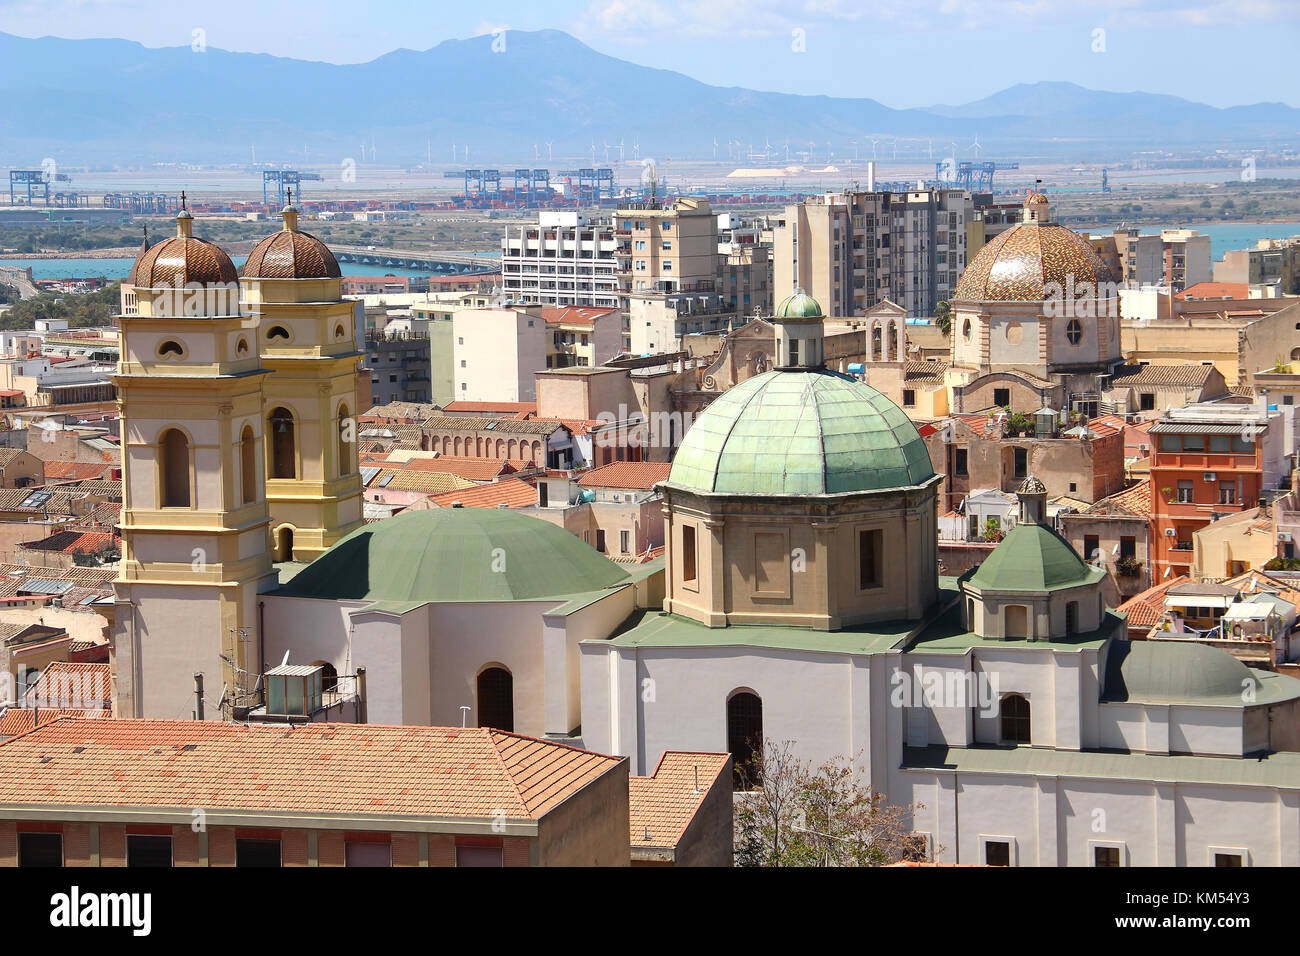 Churches un Cagliari old town, Sardinia, Italy - Stock Image